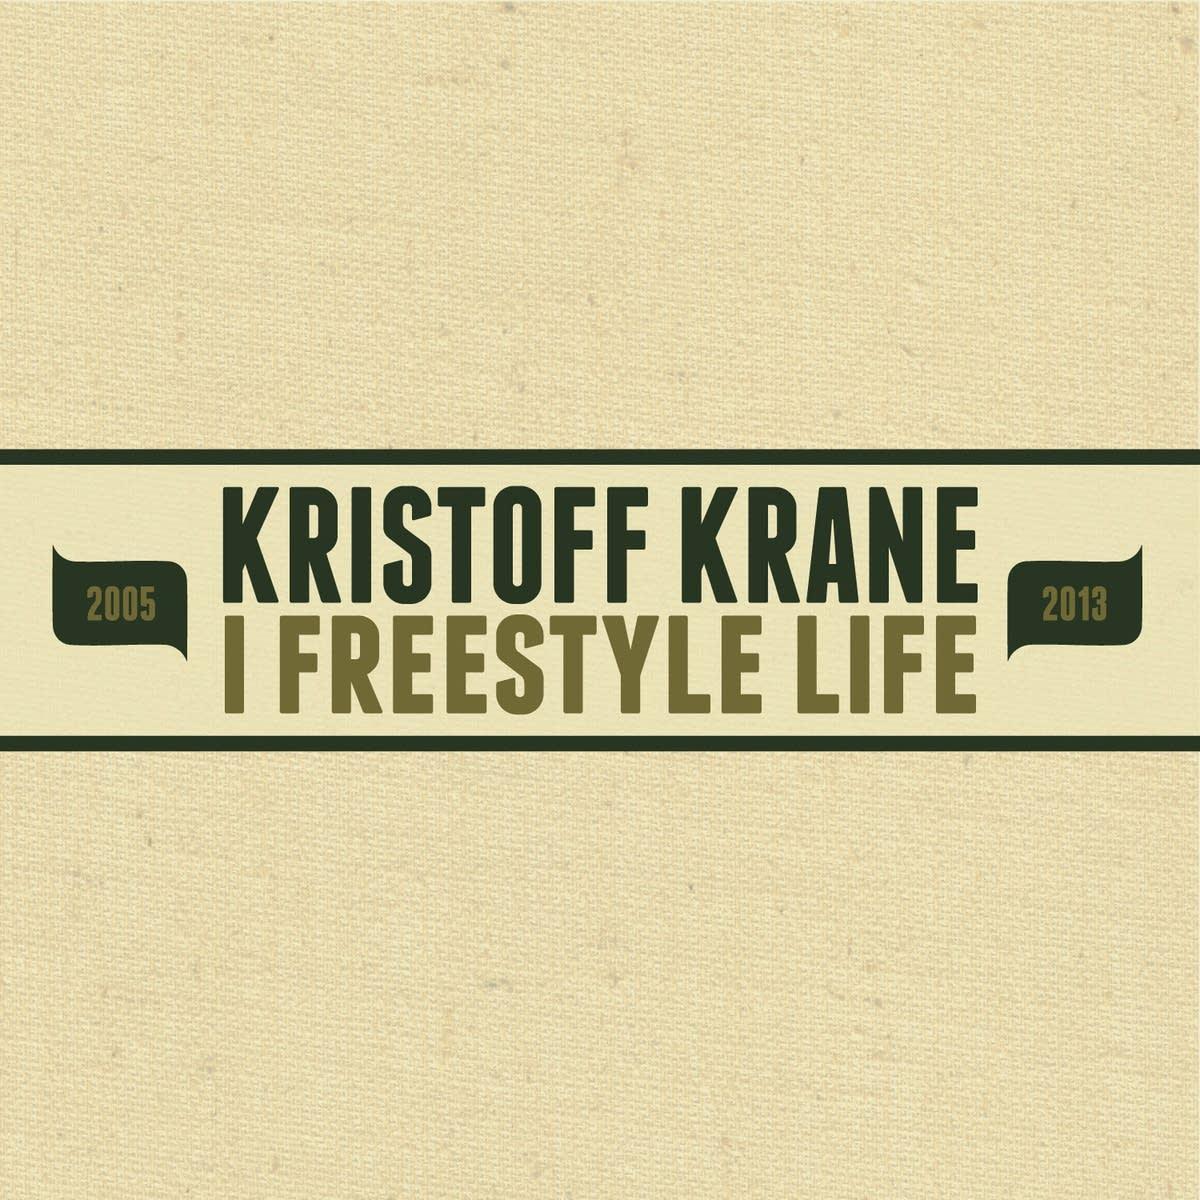 Kristoff Krane